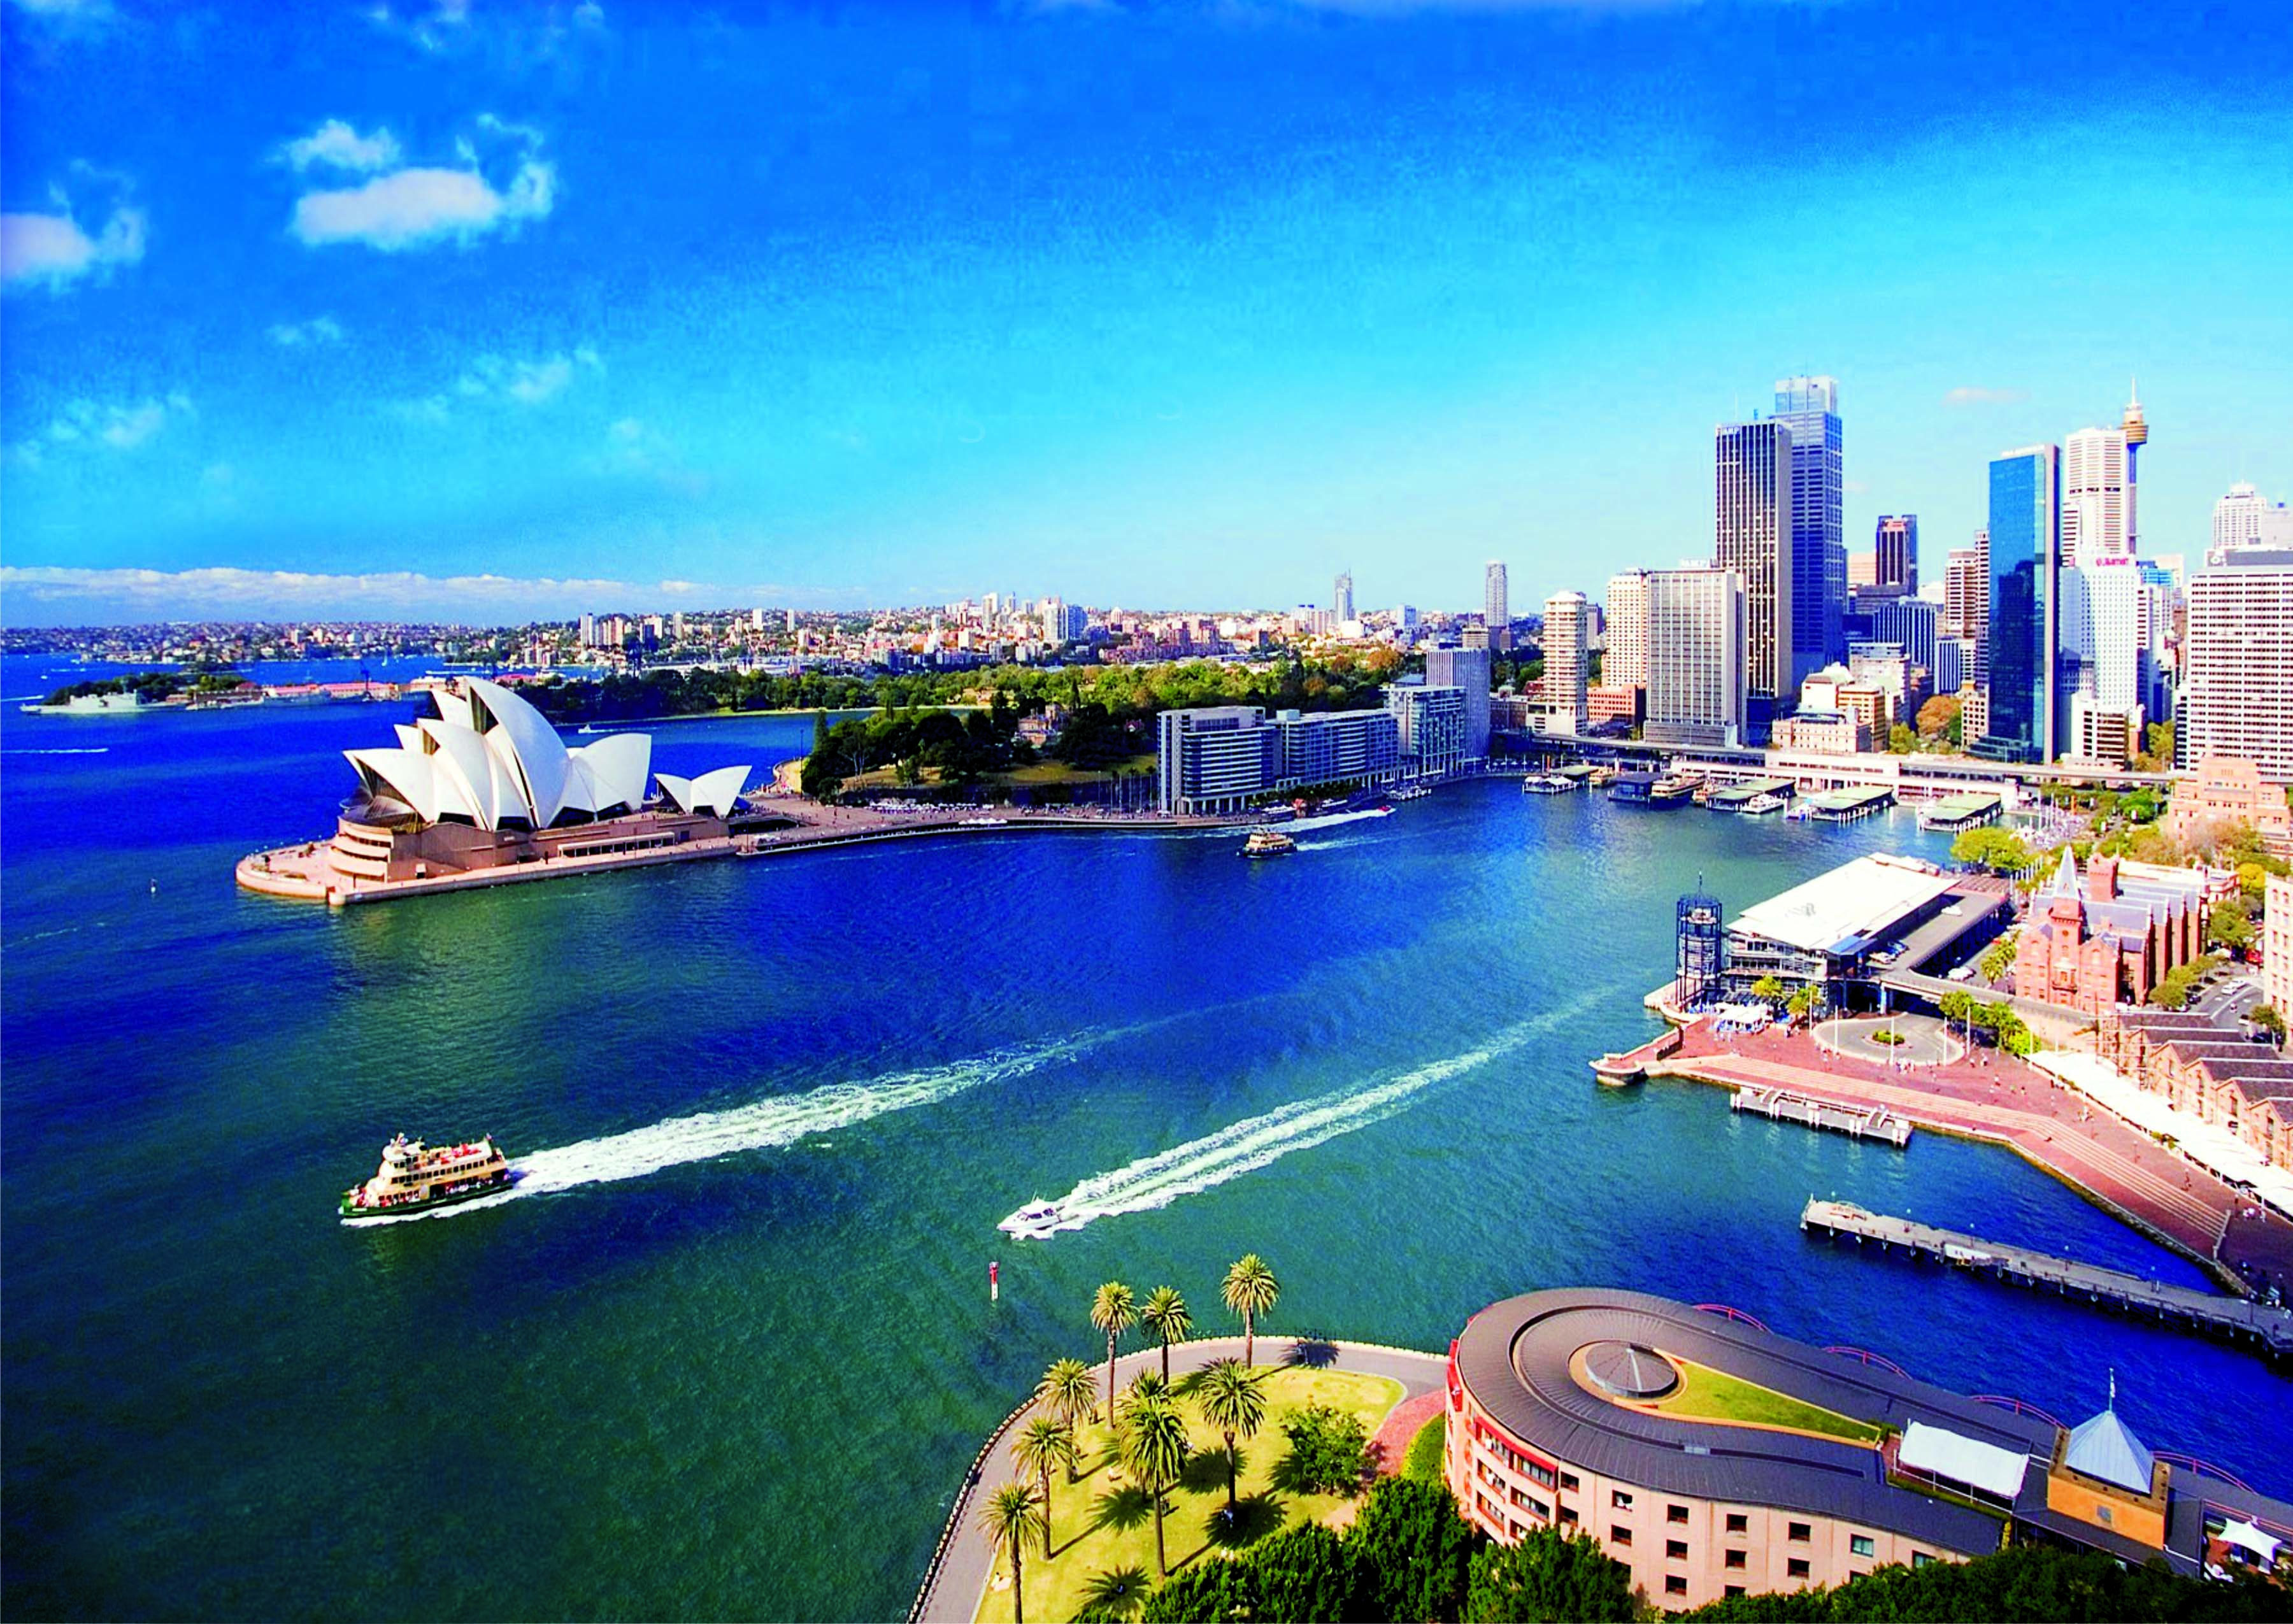 quality of life in Australia